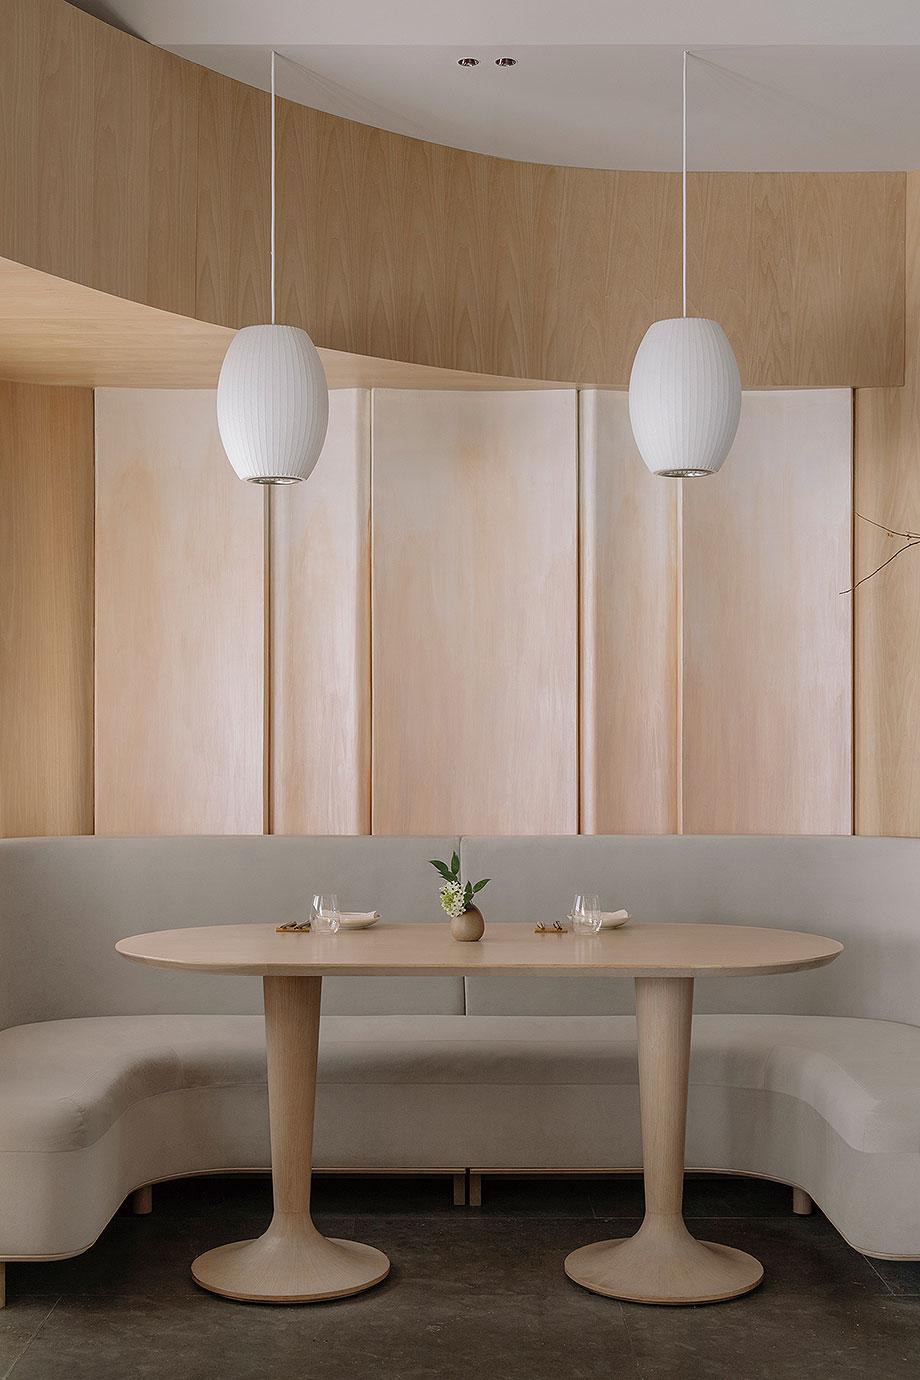 restaurante lunar en shanghai de so studio (11) - foto wen studio